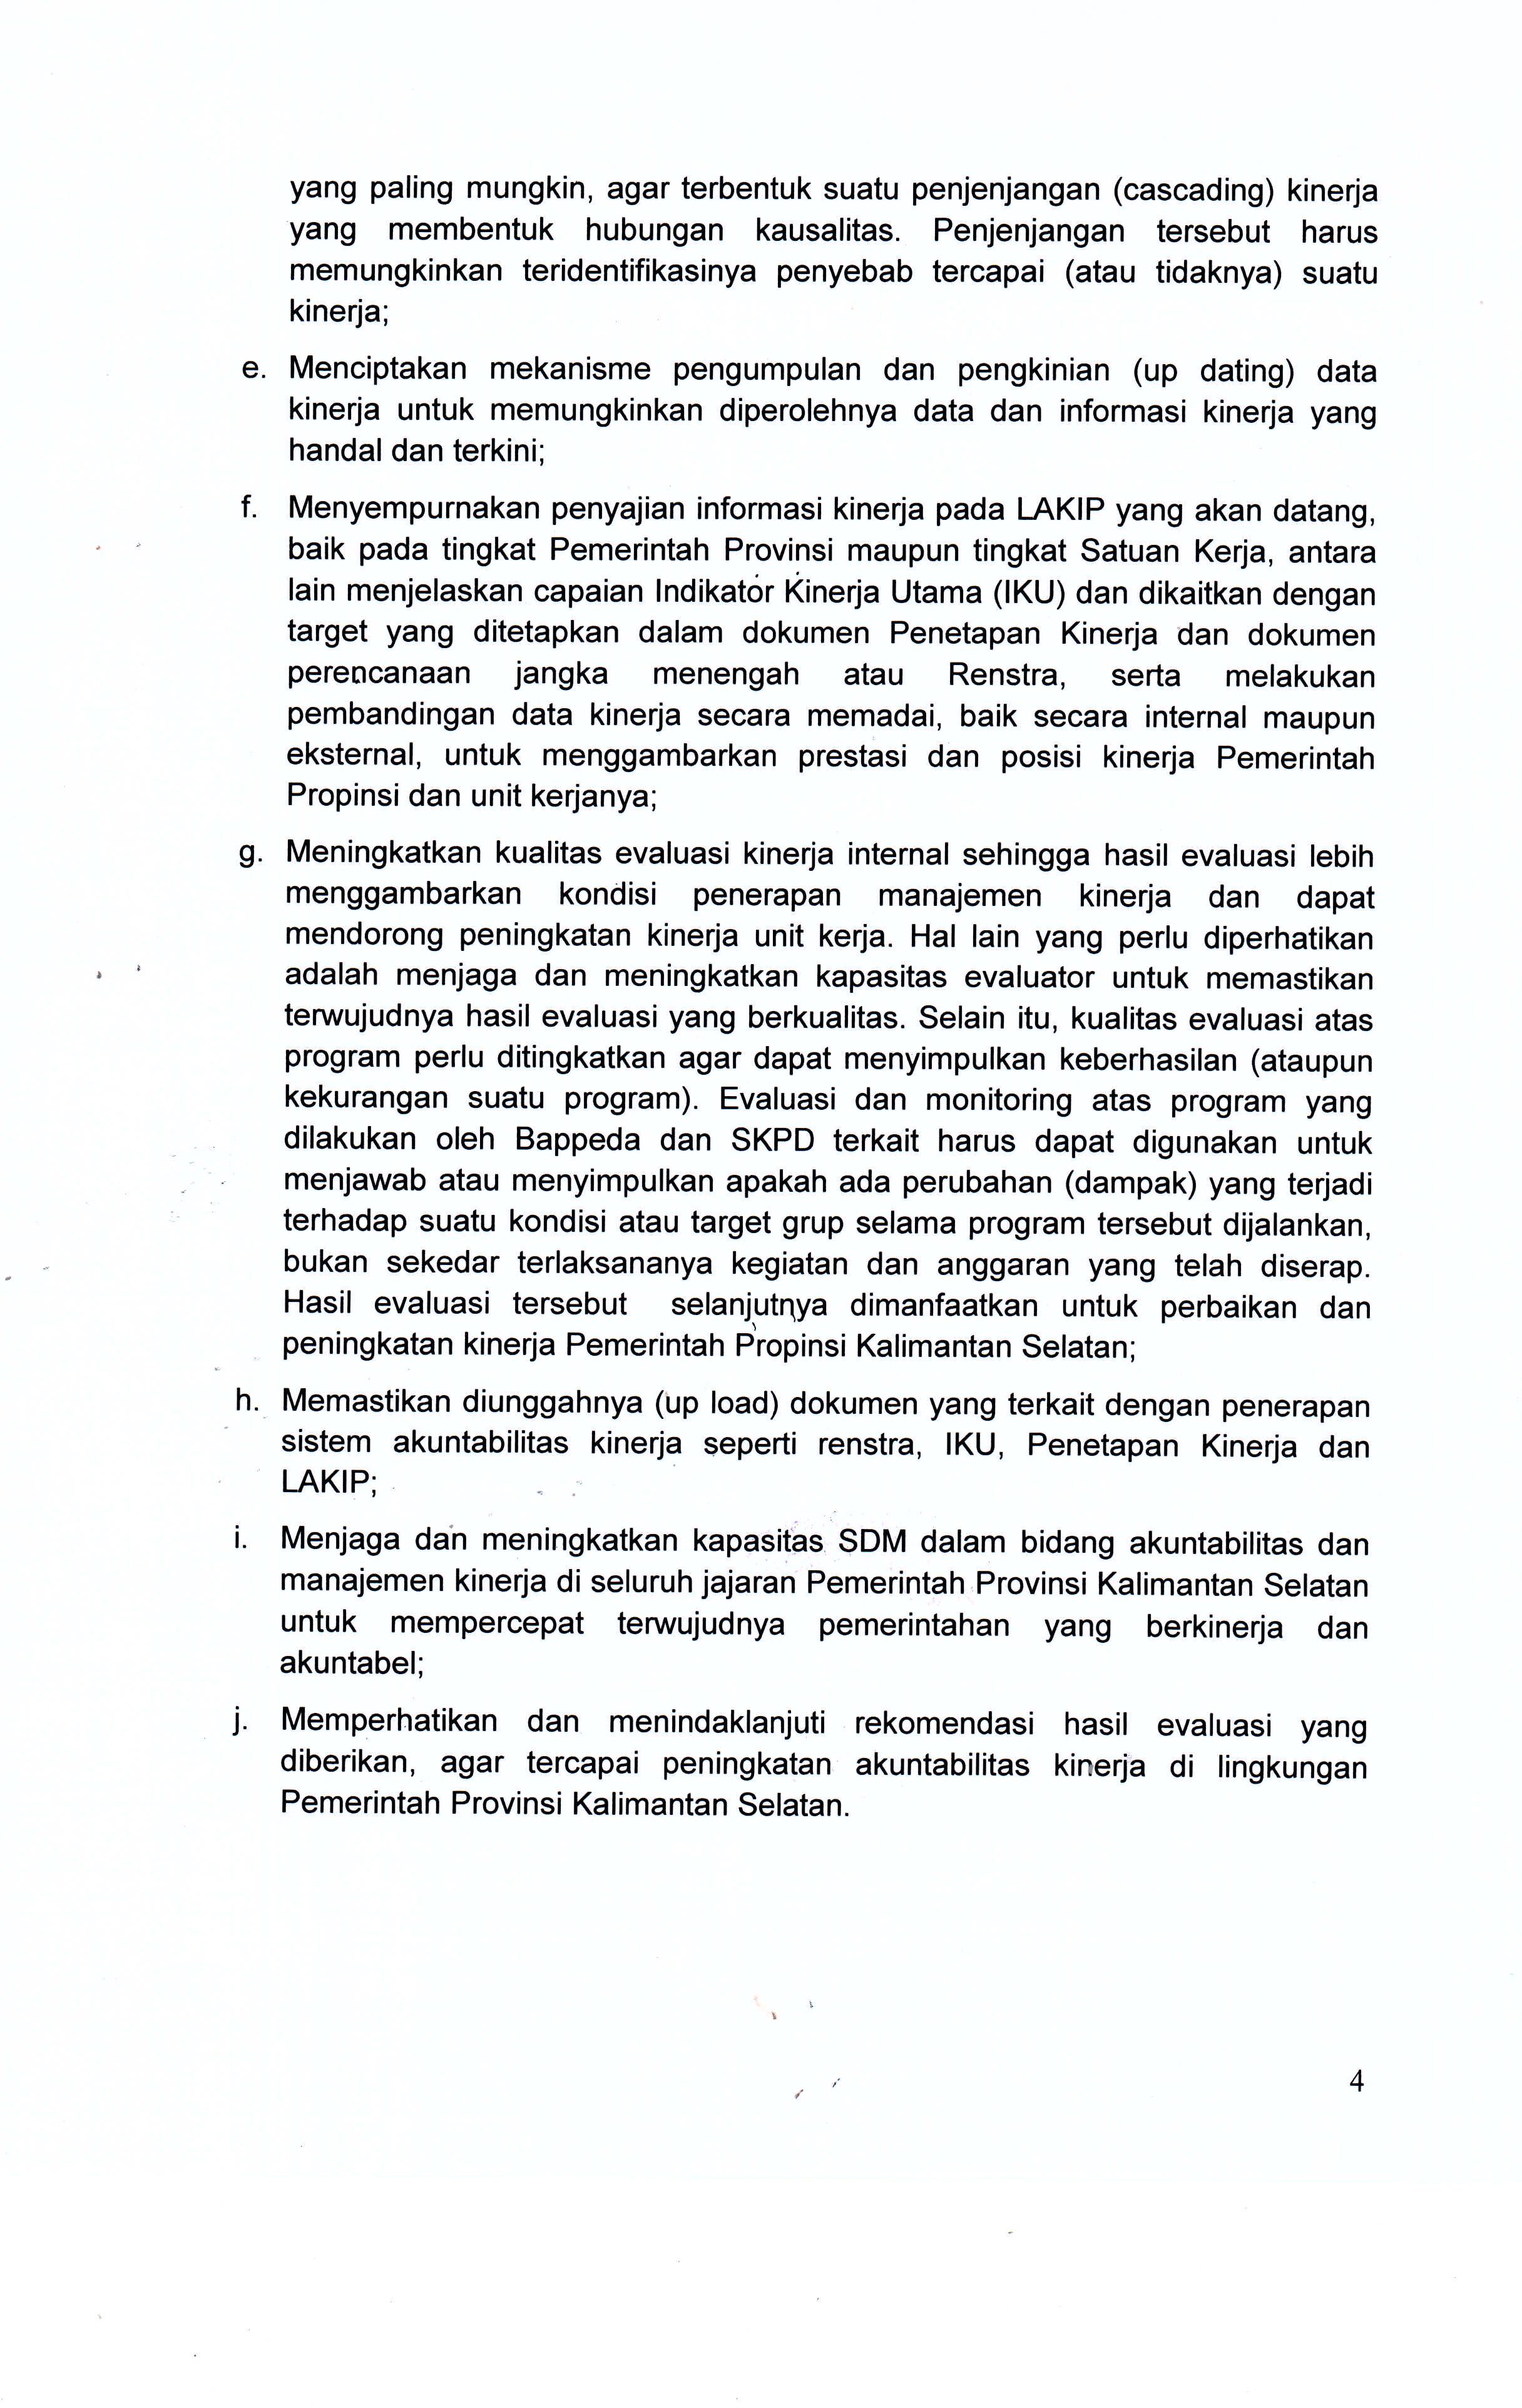 judul tesis tentang hukum pidana Daftar judul contoh-contoh skripsi hukum pidana by tinjauan yuridis tentang tindak pidana daftar judul contoh-contoh tesis magister hukum.